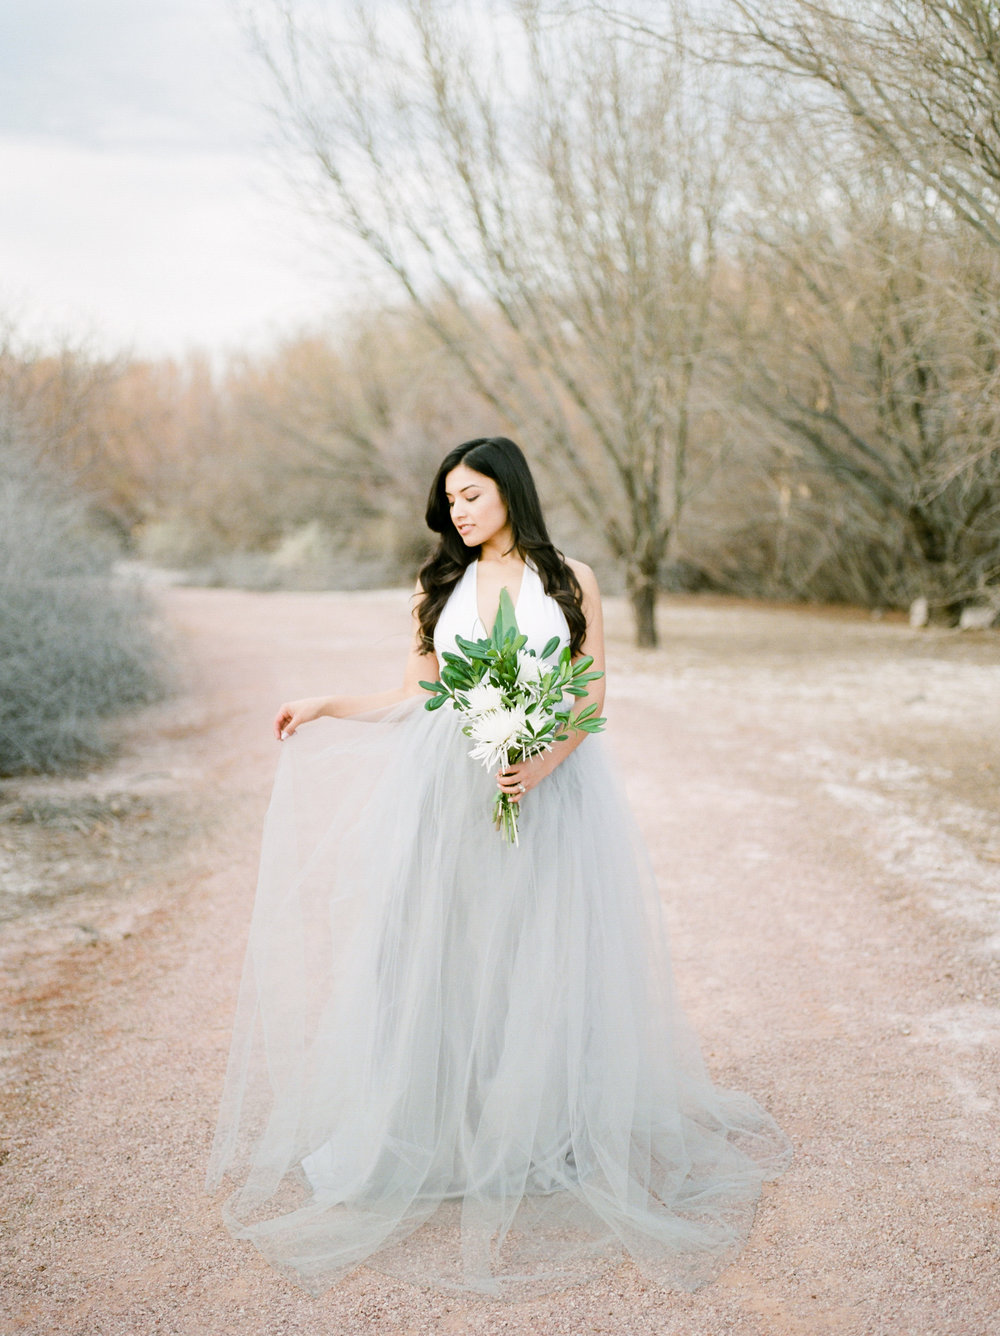 Rhianna-Mercier-Photography-Fine-Art-Film-Photographer-Las-Vegas-2017-613190010001.jpg